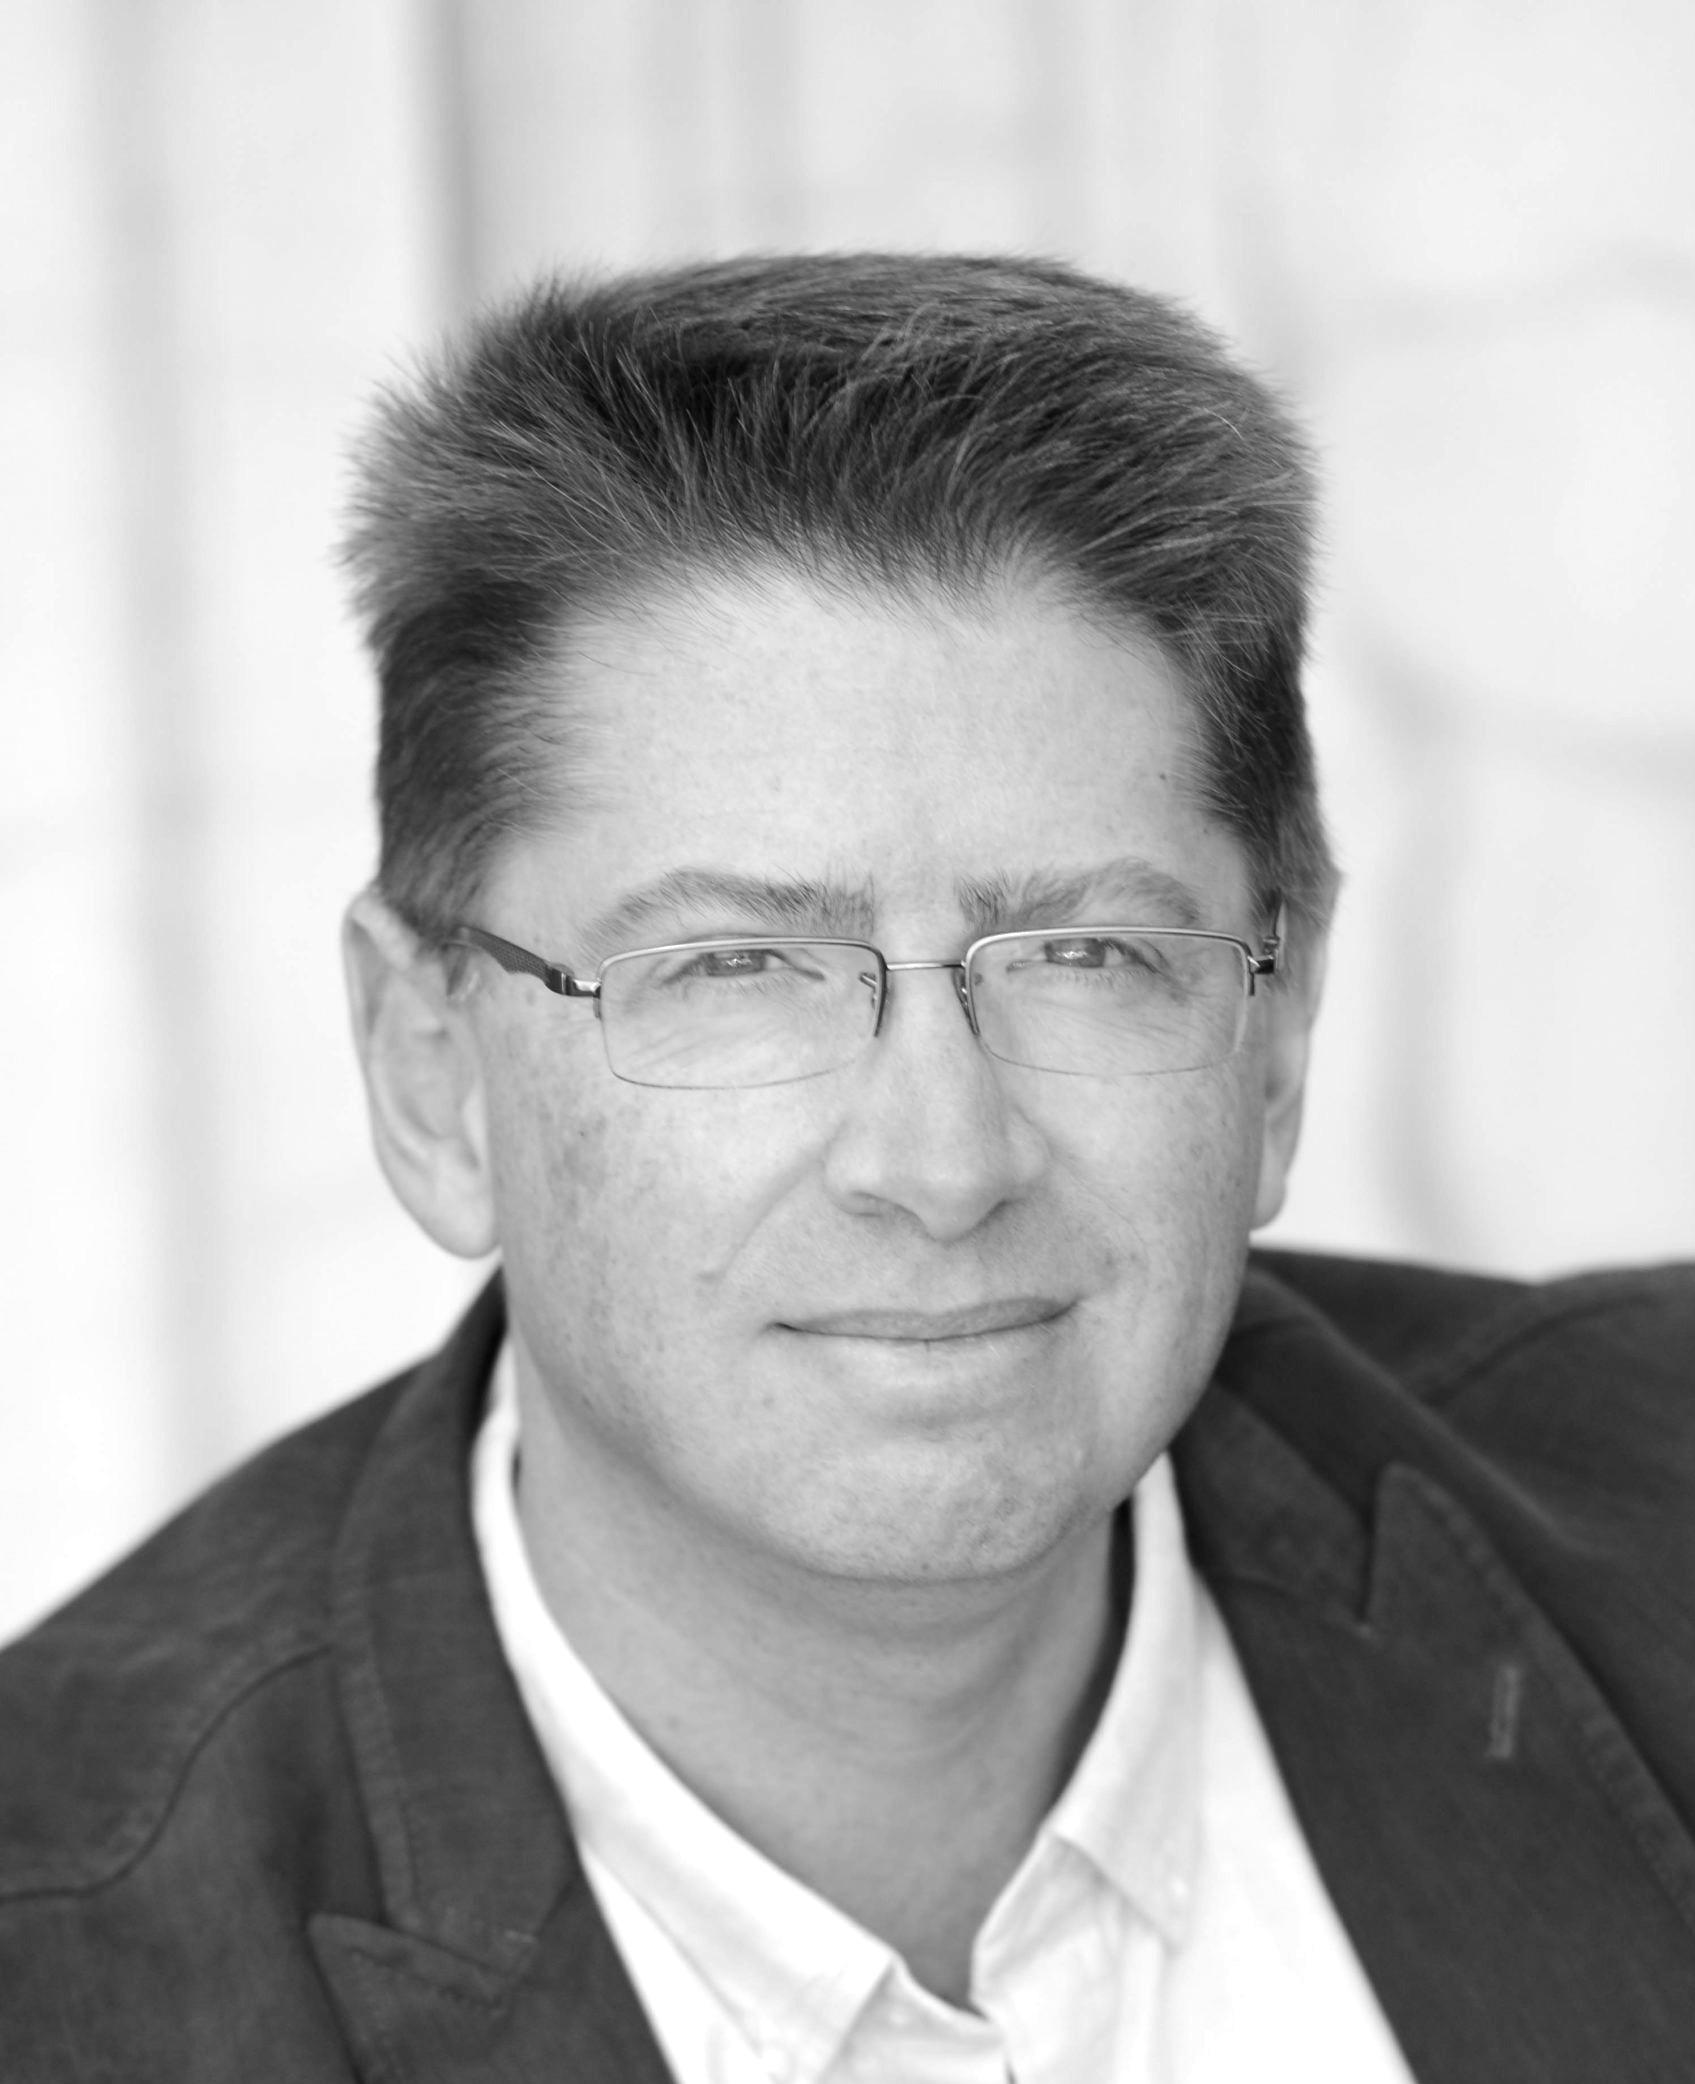 Dr. Tyler Nordgren